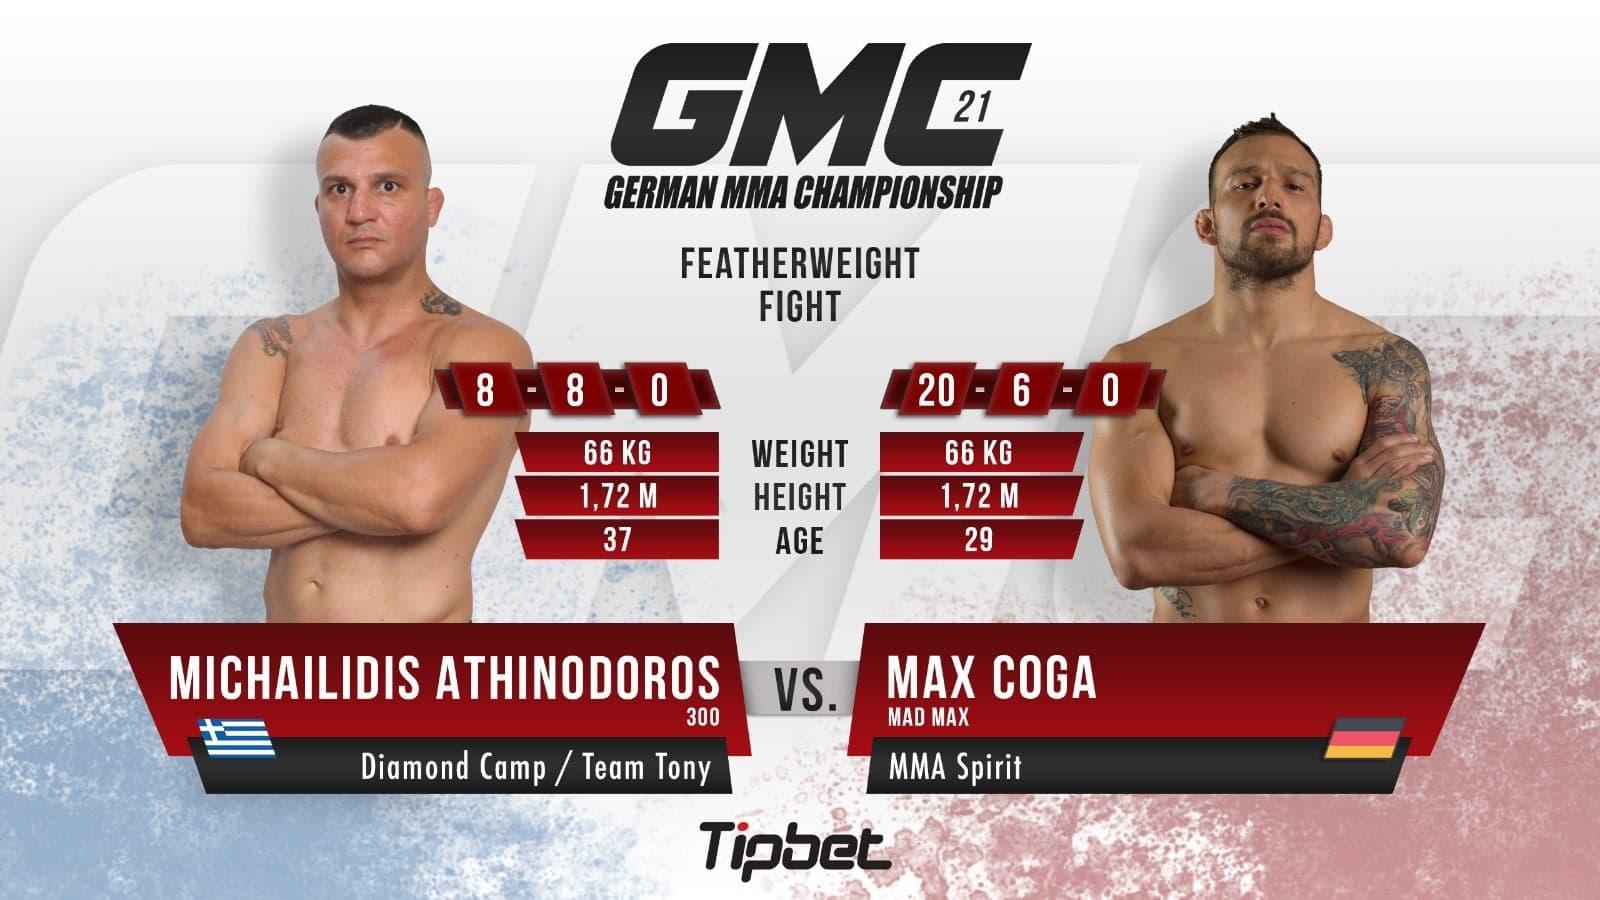 GMC Coga vs Athinodoros